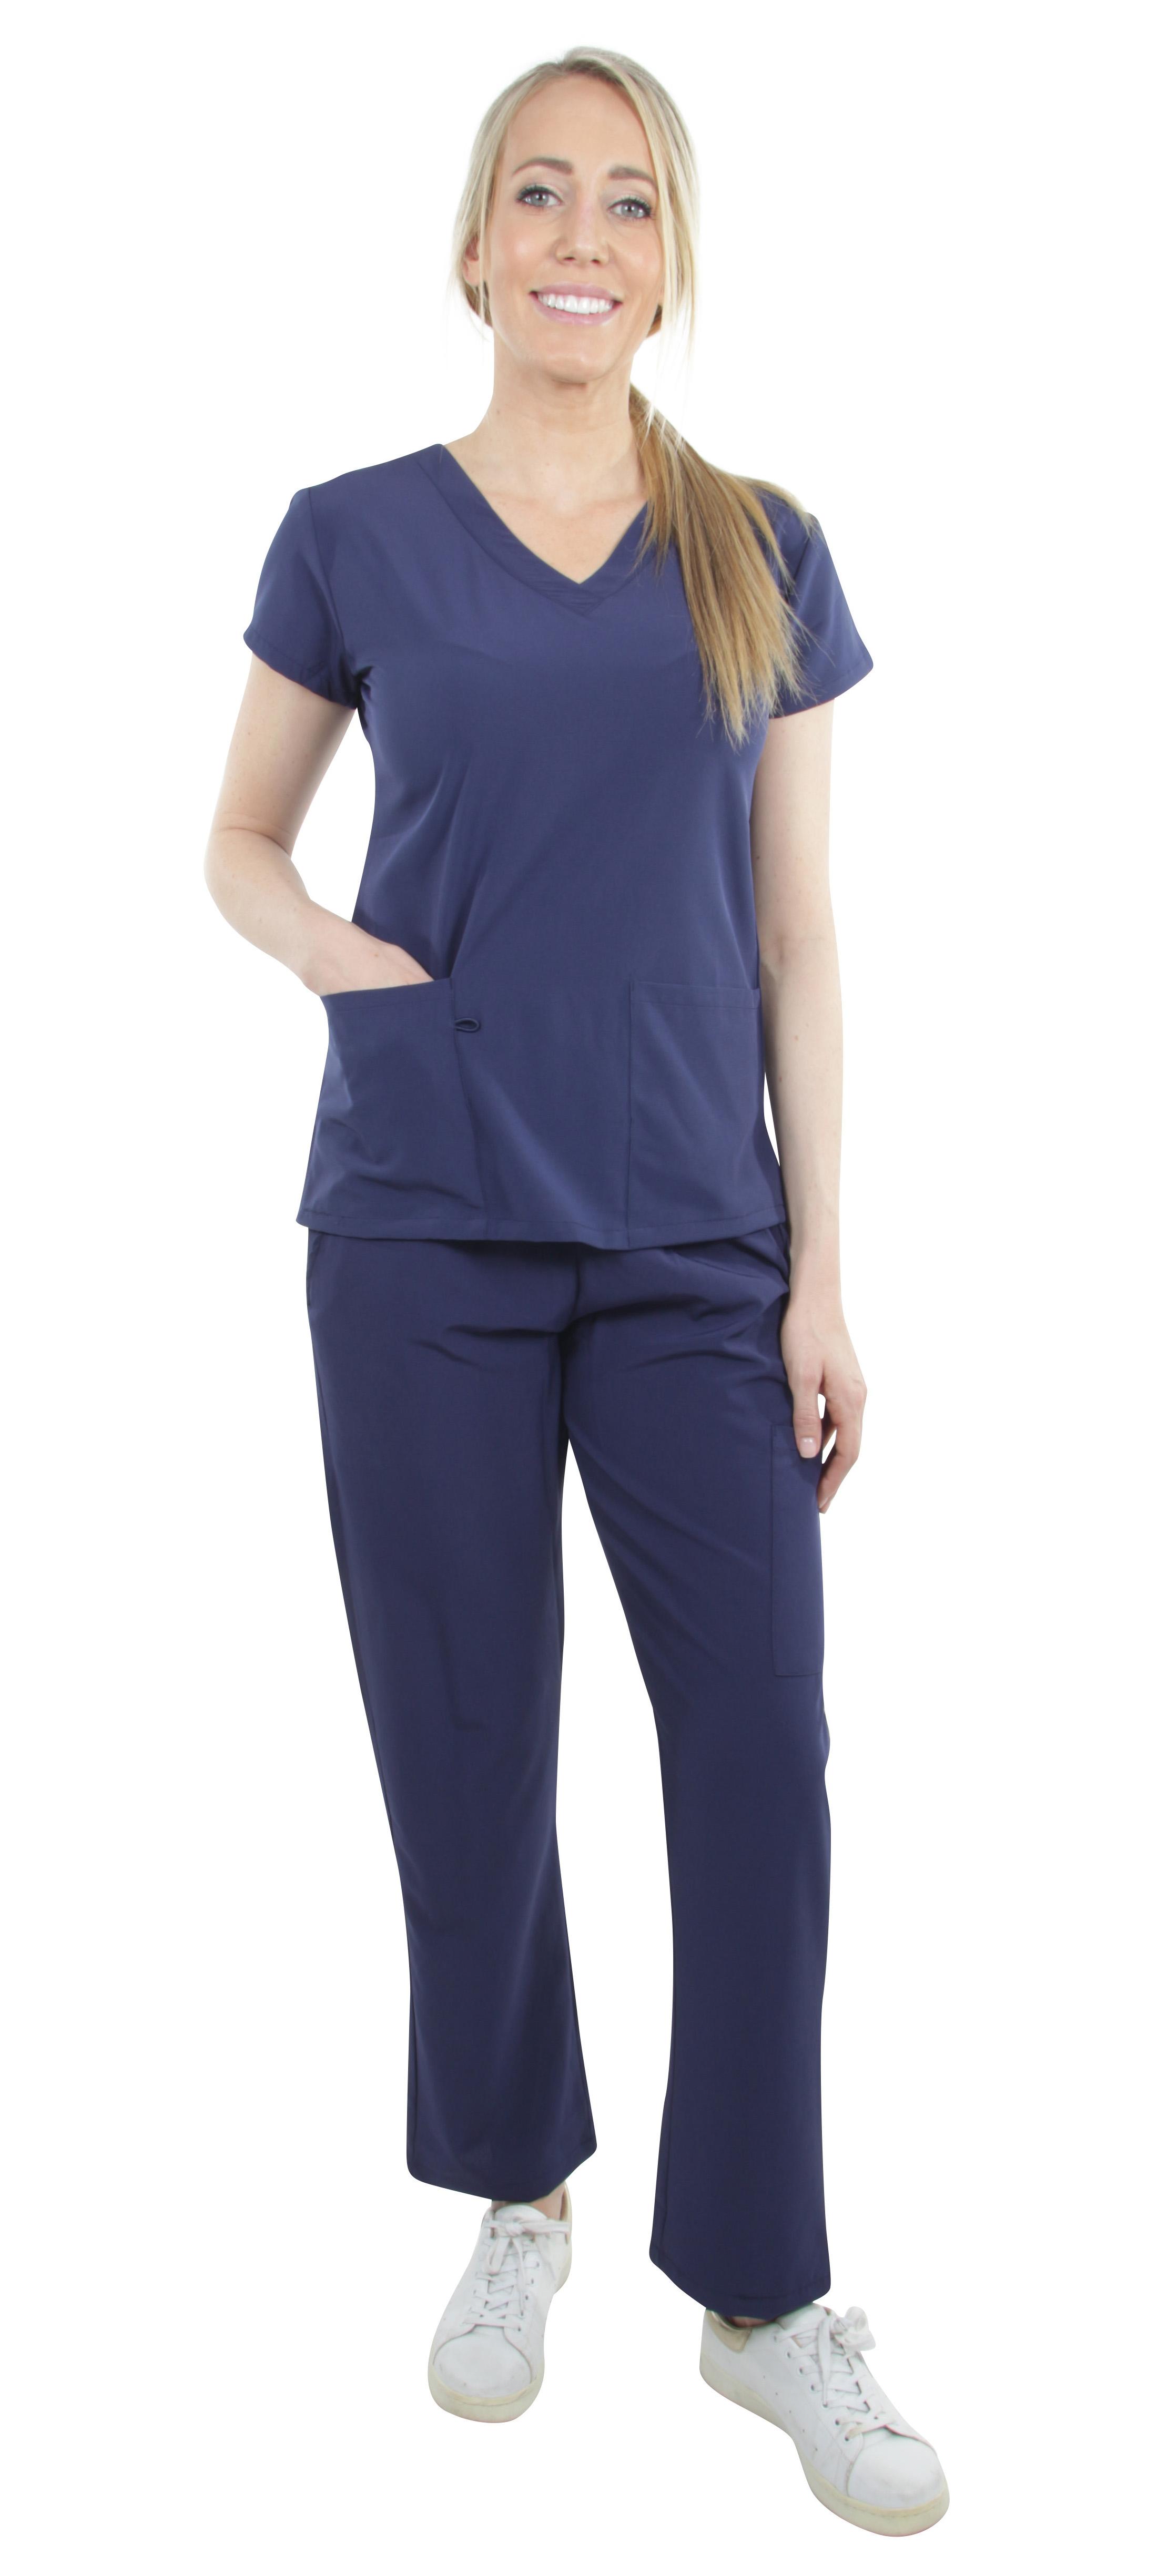 Unisex-Performance-Stretch-Medical-Uniform-Five-Pockets-V-Neck-Scrubs-Sets miniature 35